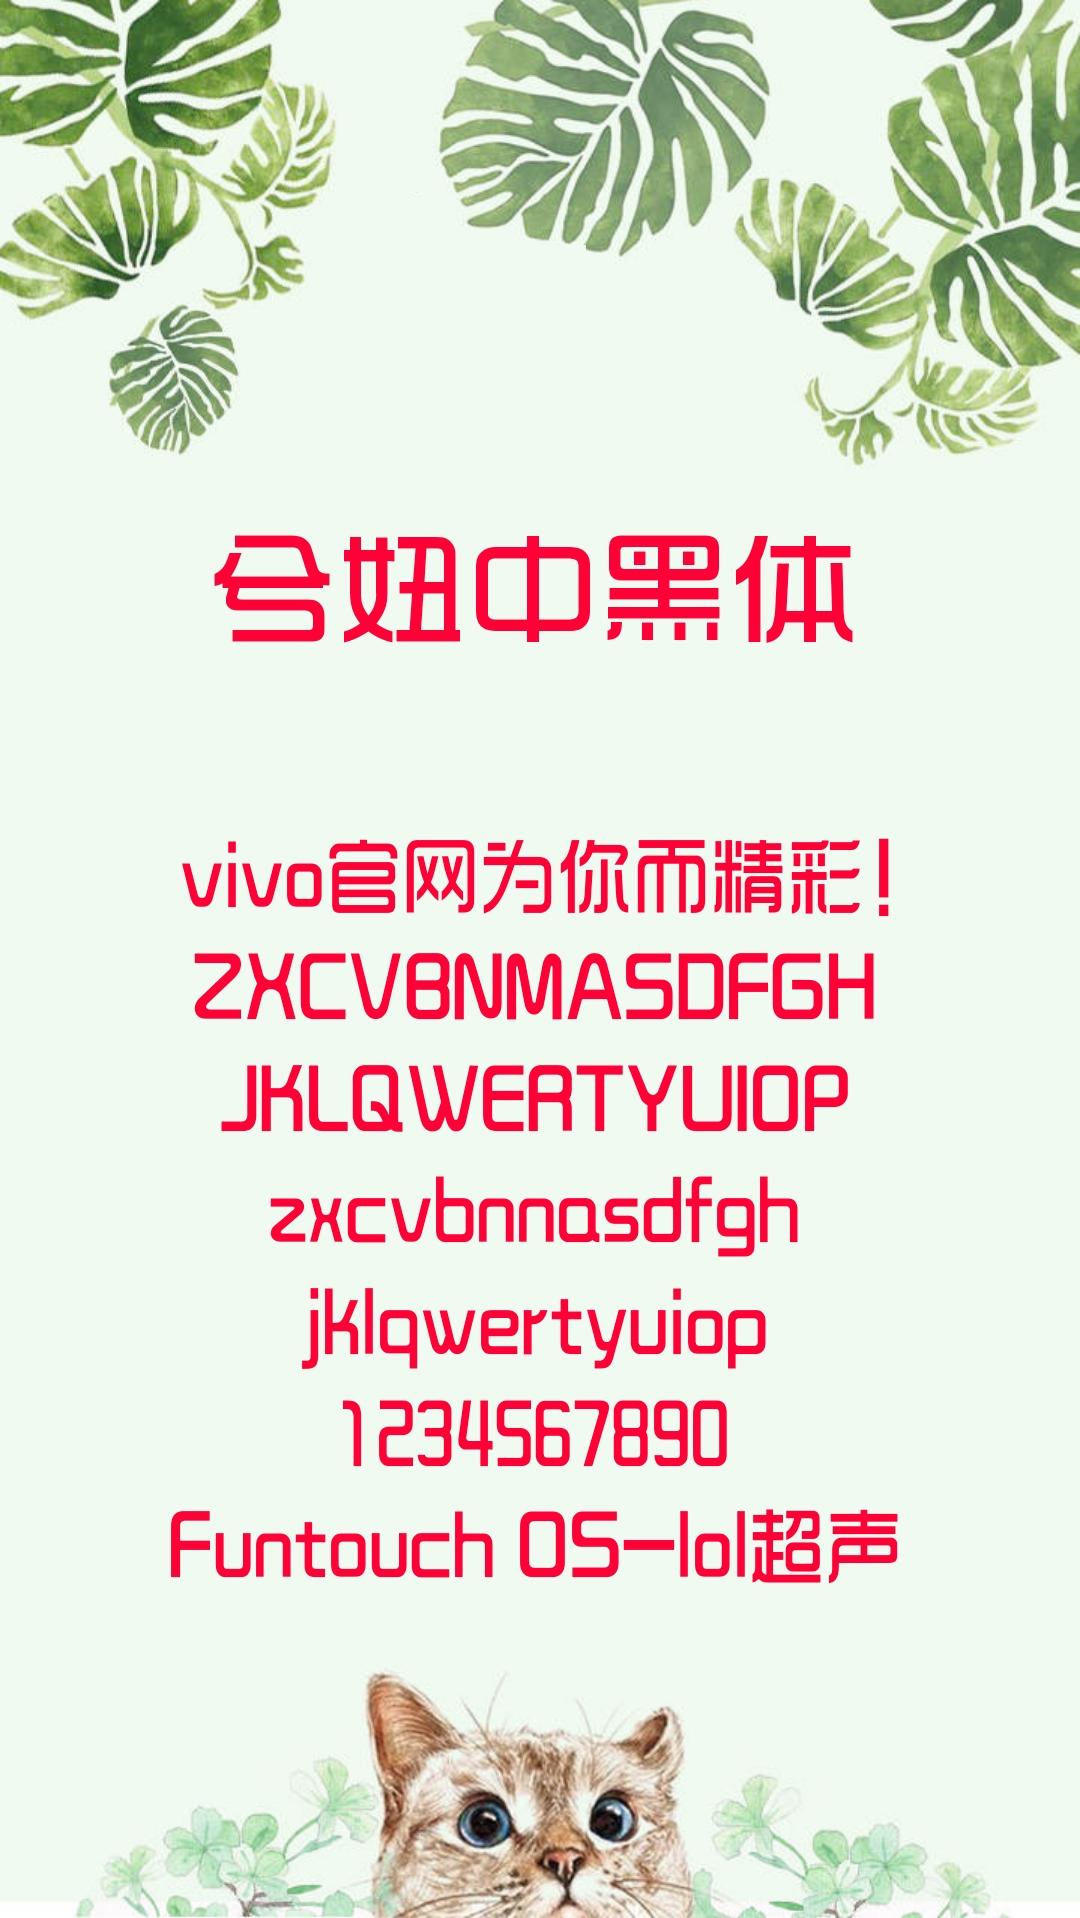 IMG_20180519_194430.jpg